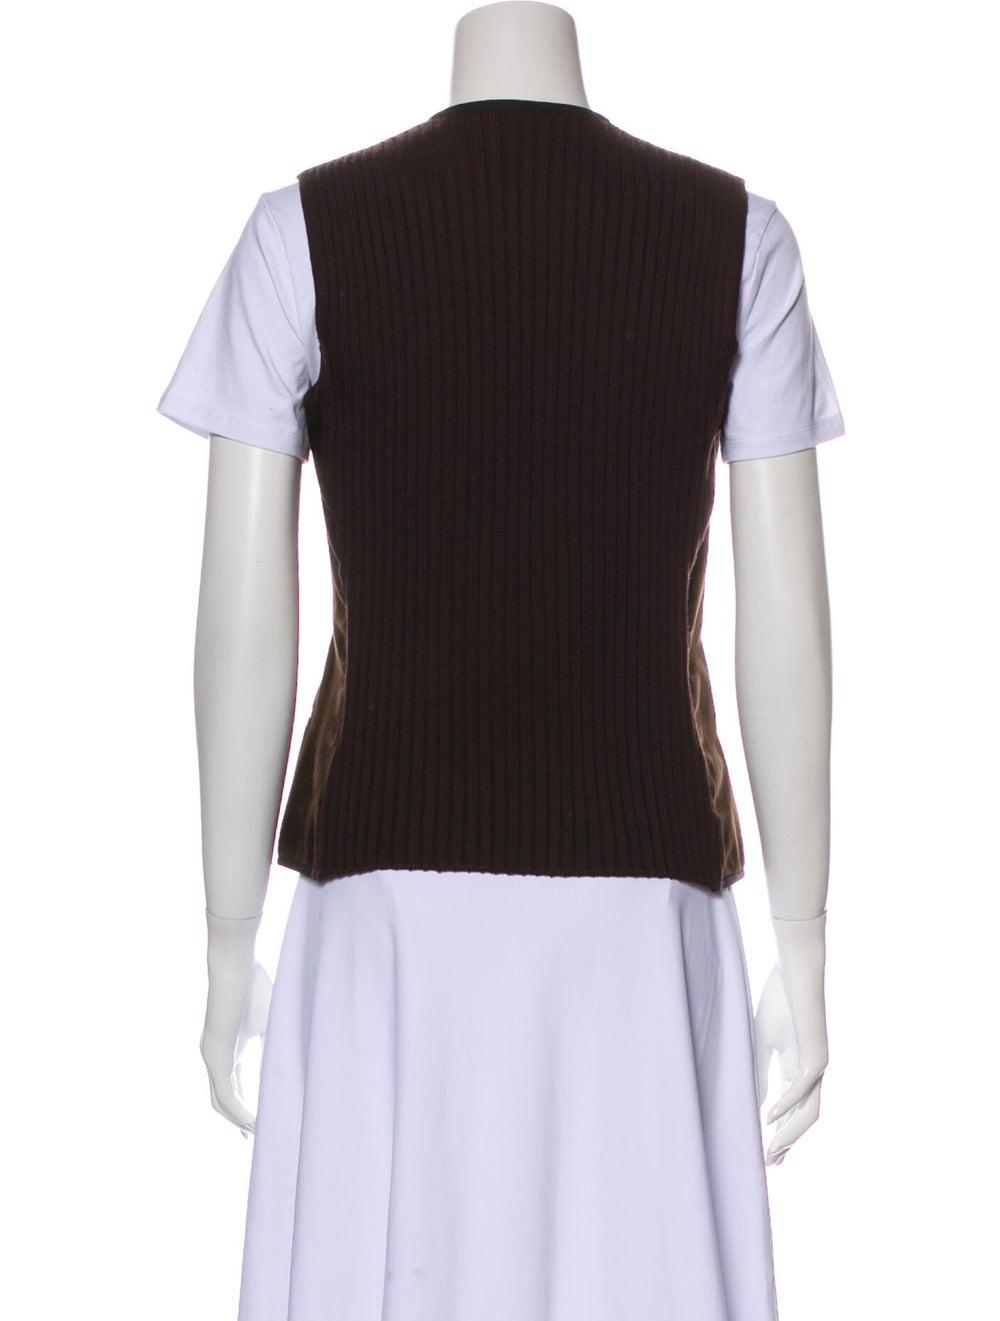 Fendi Leather Vest Green - image 3